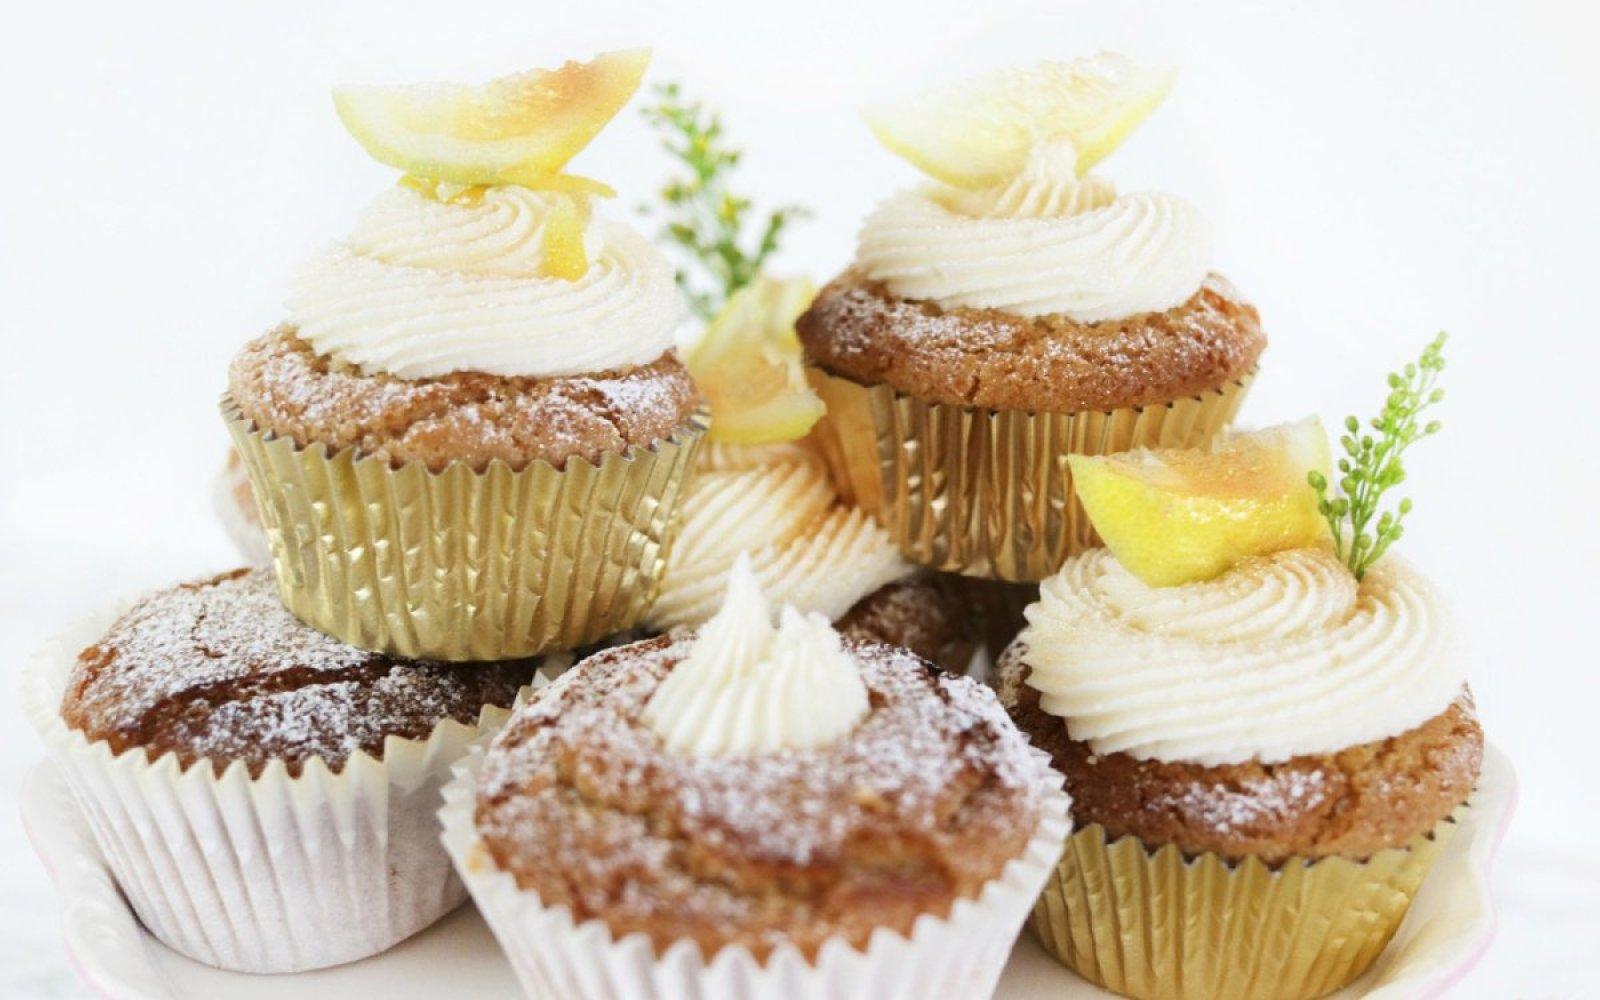 Vegan Gluten-Free Lemon Drizzle Cupcakes Stacked